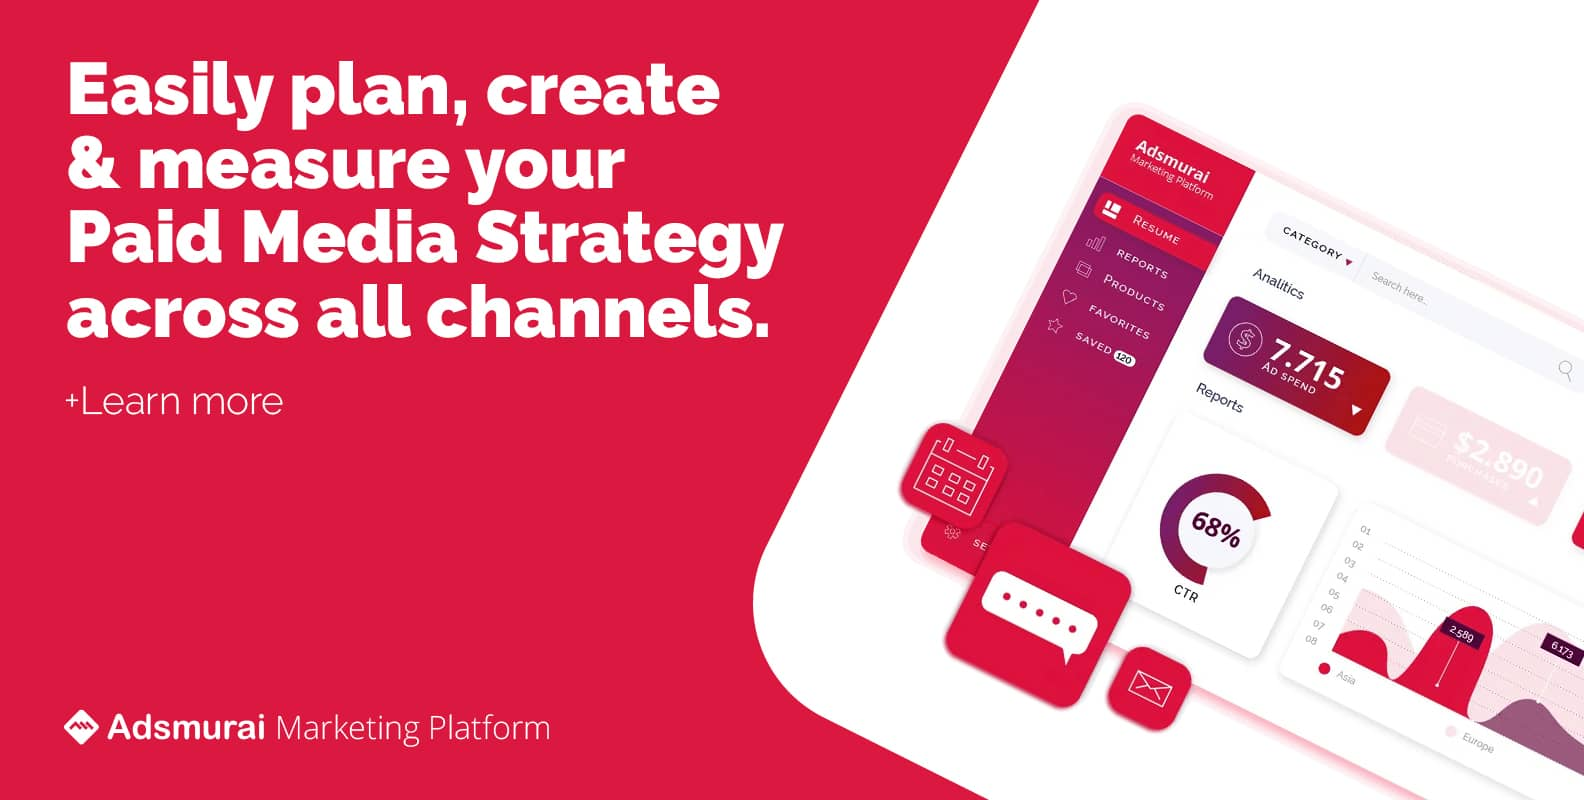 Adsmurai Marketing Platform